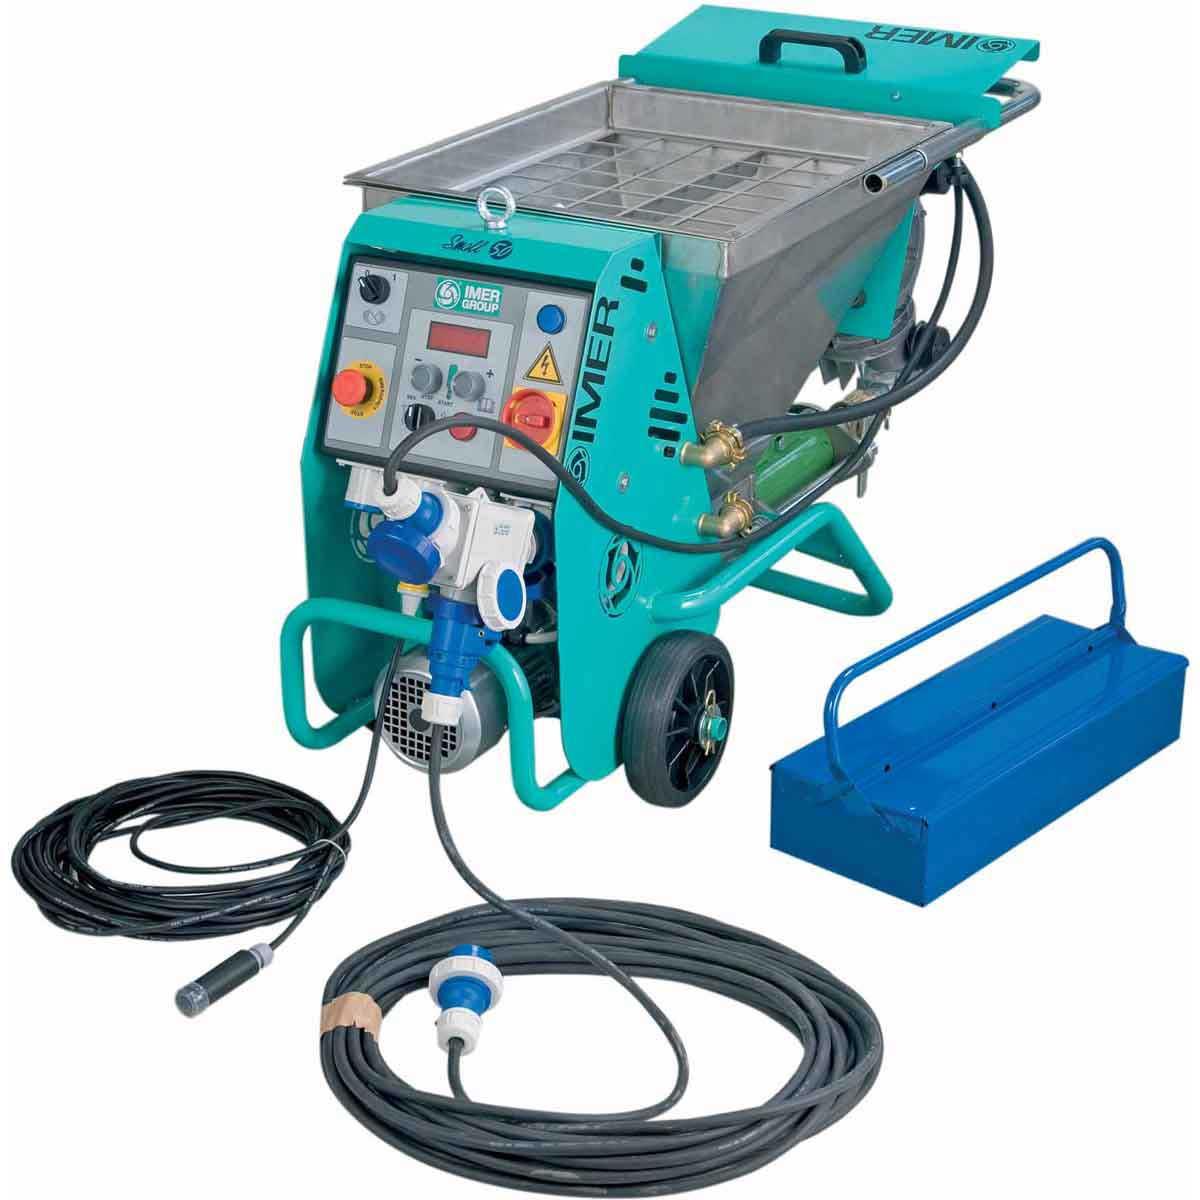 1106045 Imer Small 50 pump